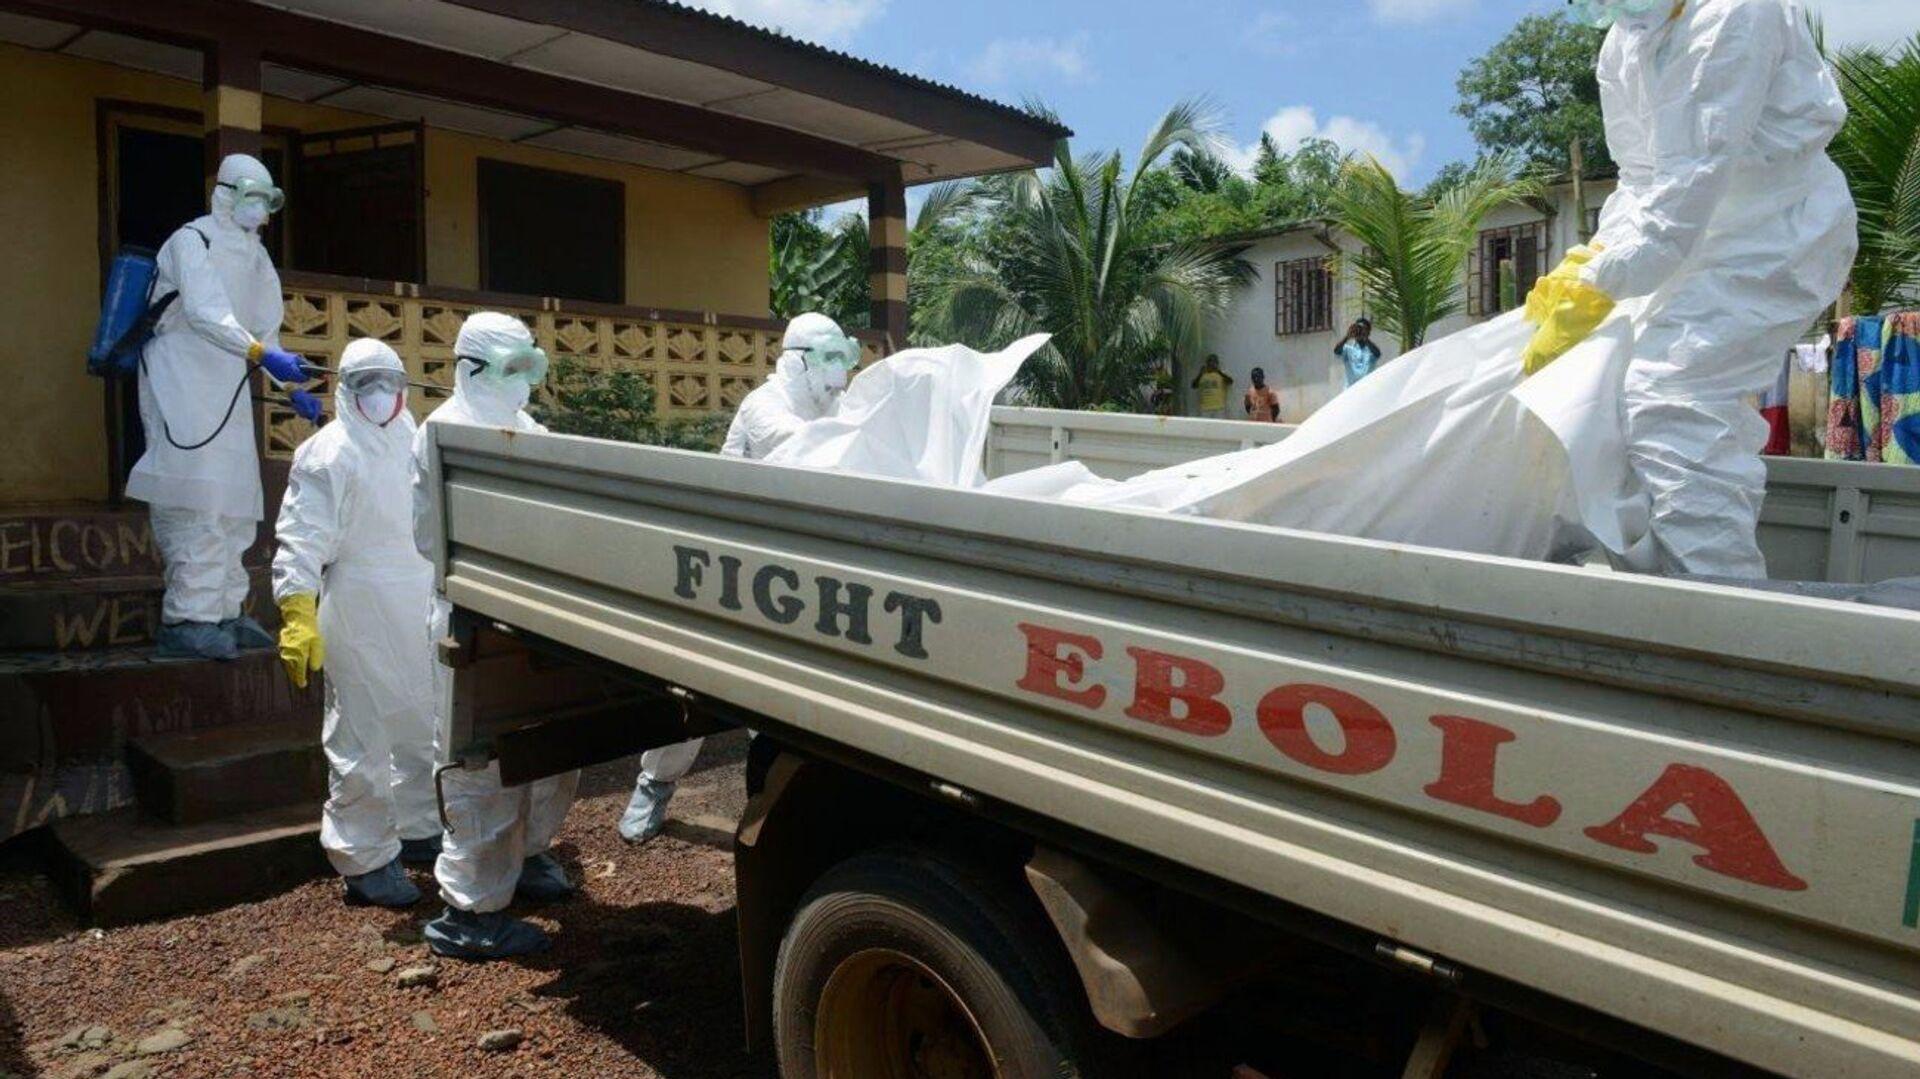 Epidemia de ebola en África (archivo) - Sputnik Mundo, 1920, 18.02.2021